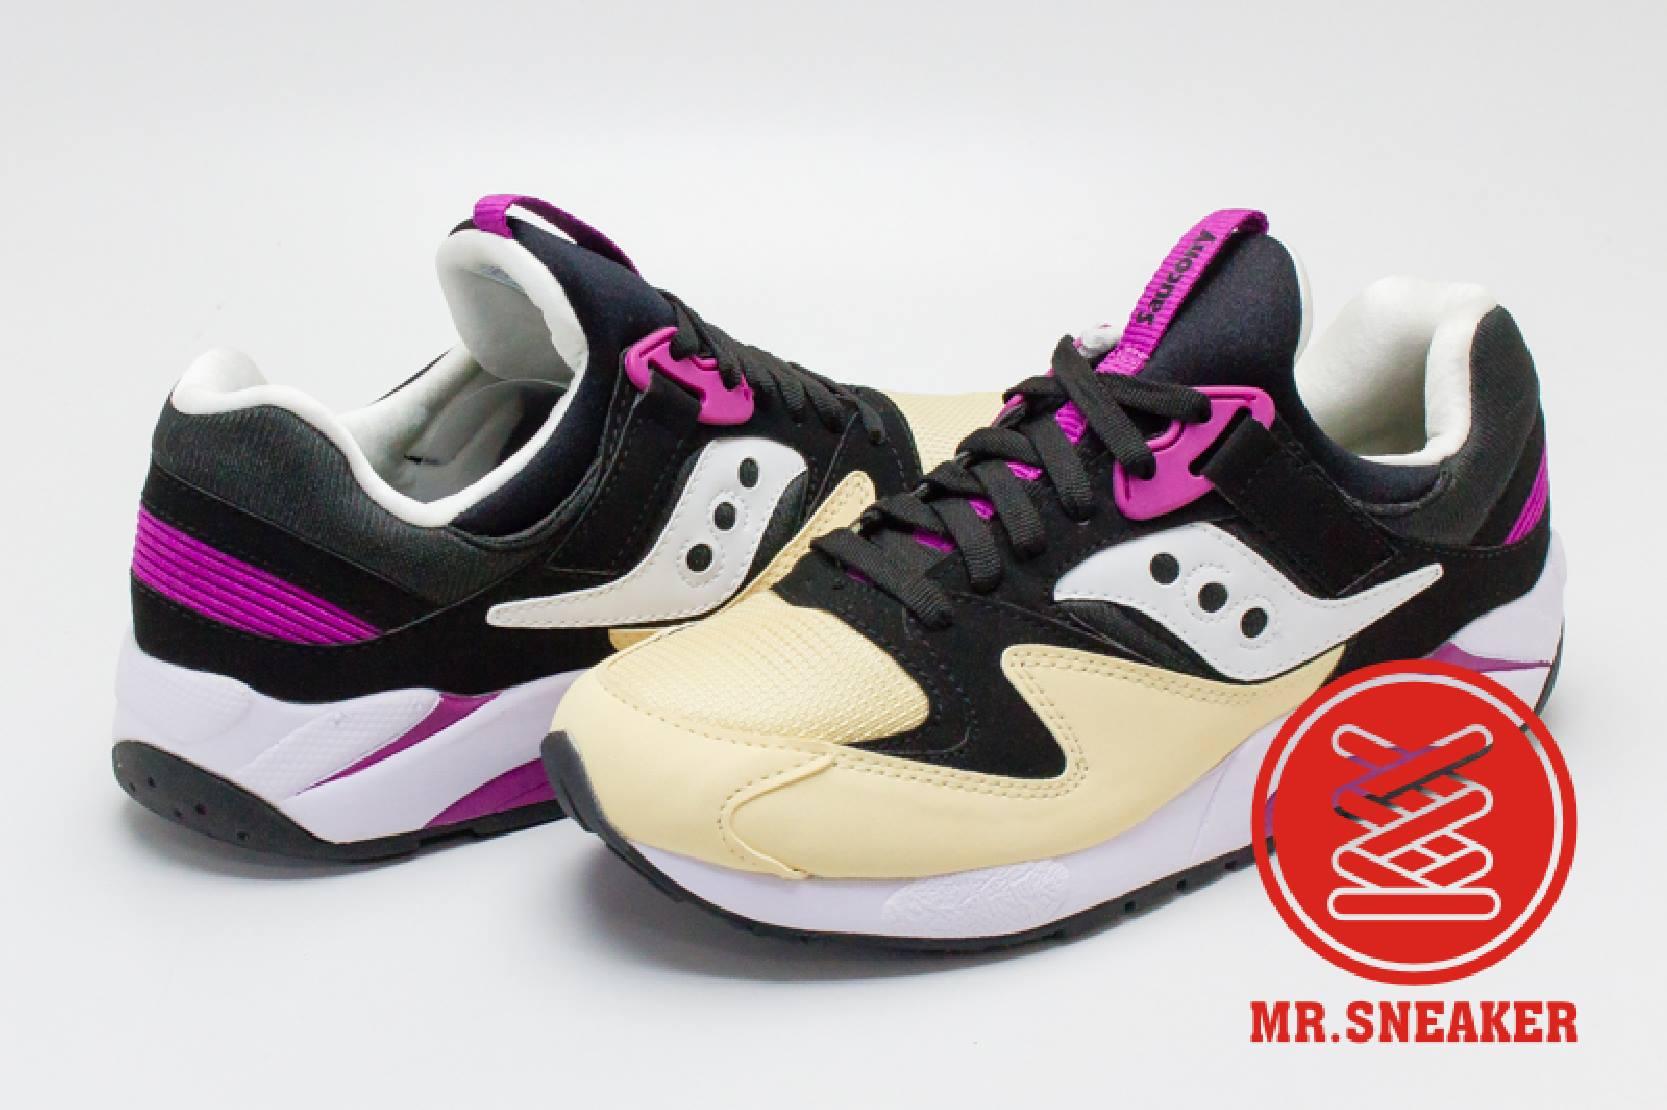 ☆Mr.Sneaker☆ Saucony Grid 9000 網狀避震 緩震 慢跑 索康尼 米黃/紫/黑 男段